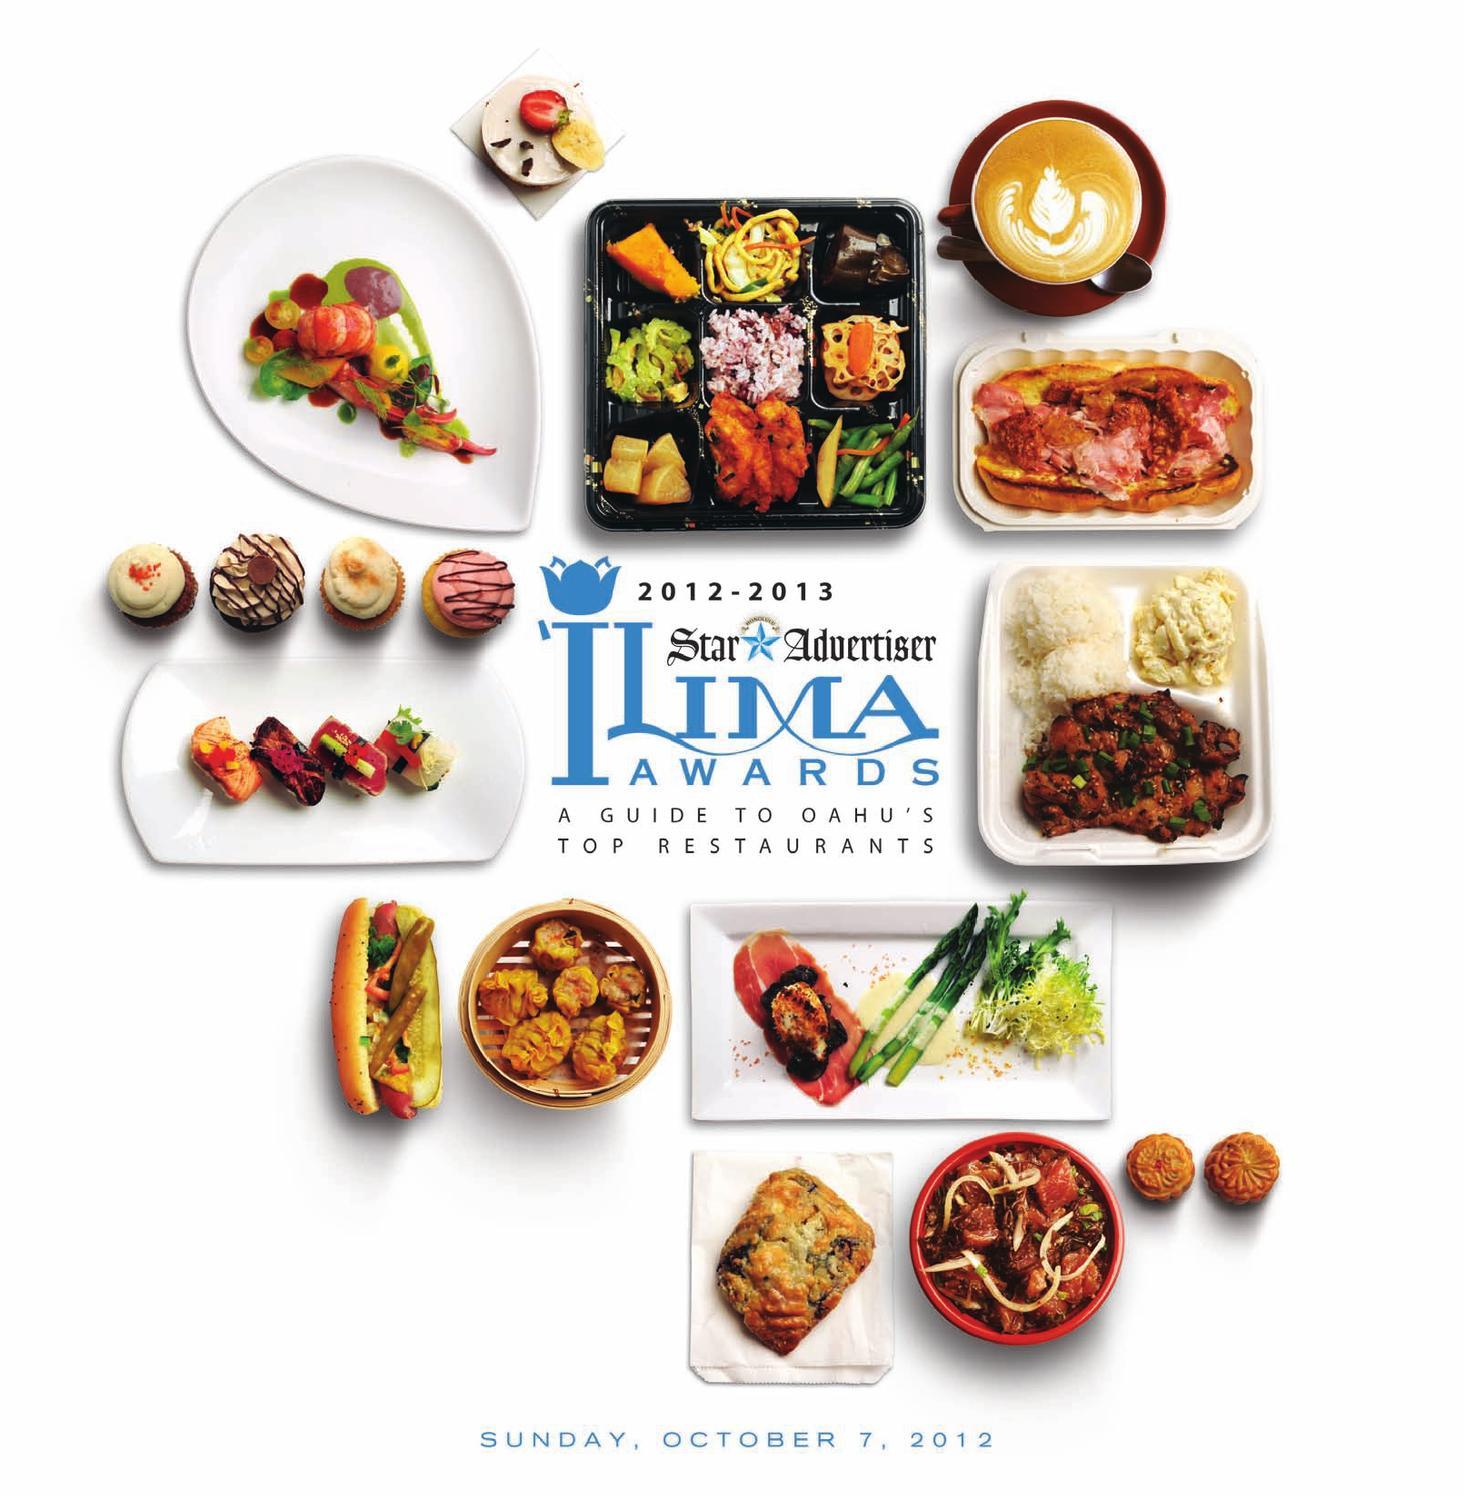 afcd96b2106 Ilima Awards 2012-2013 by Oahu Publications